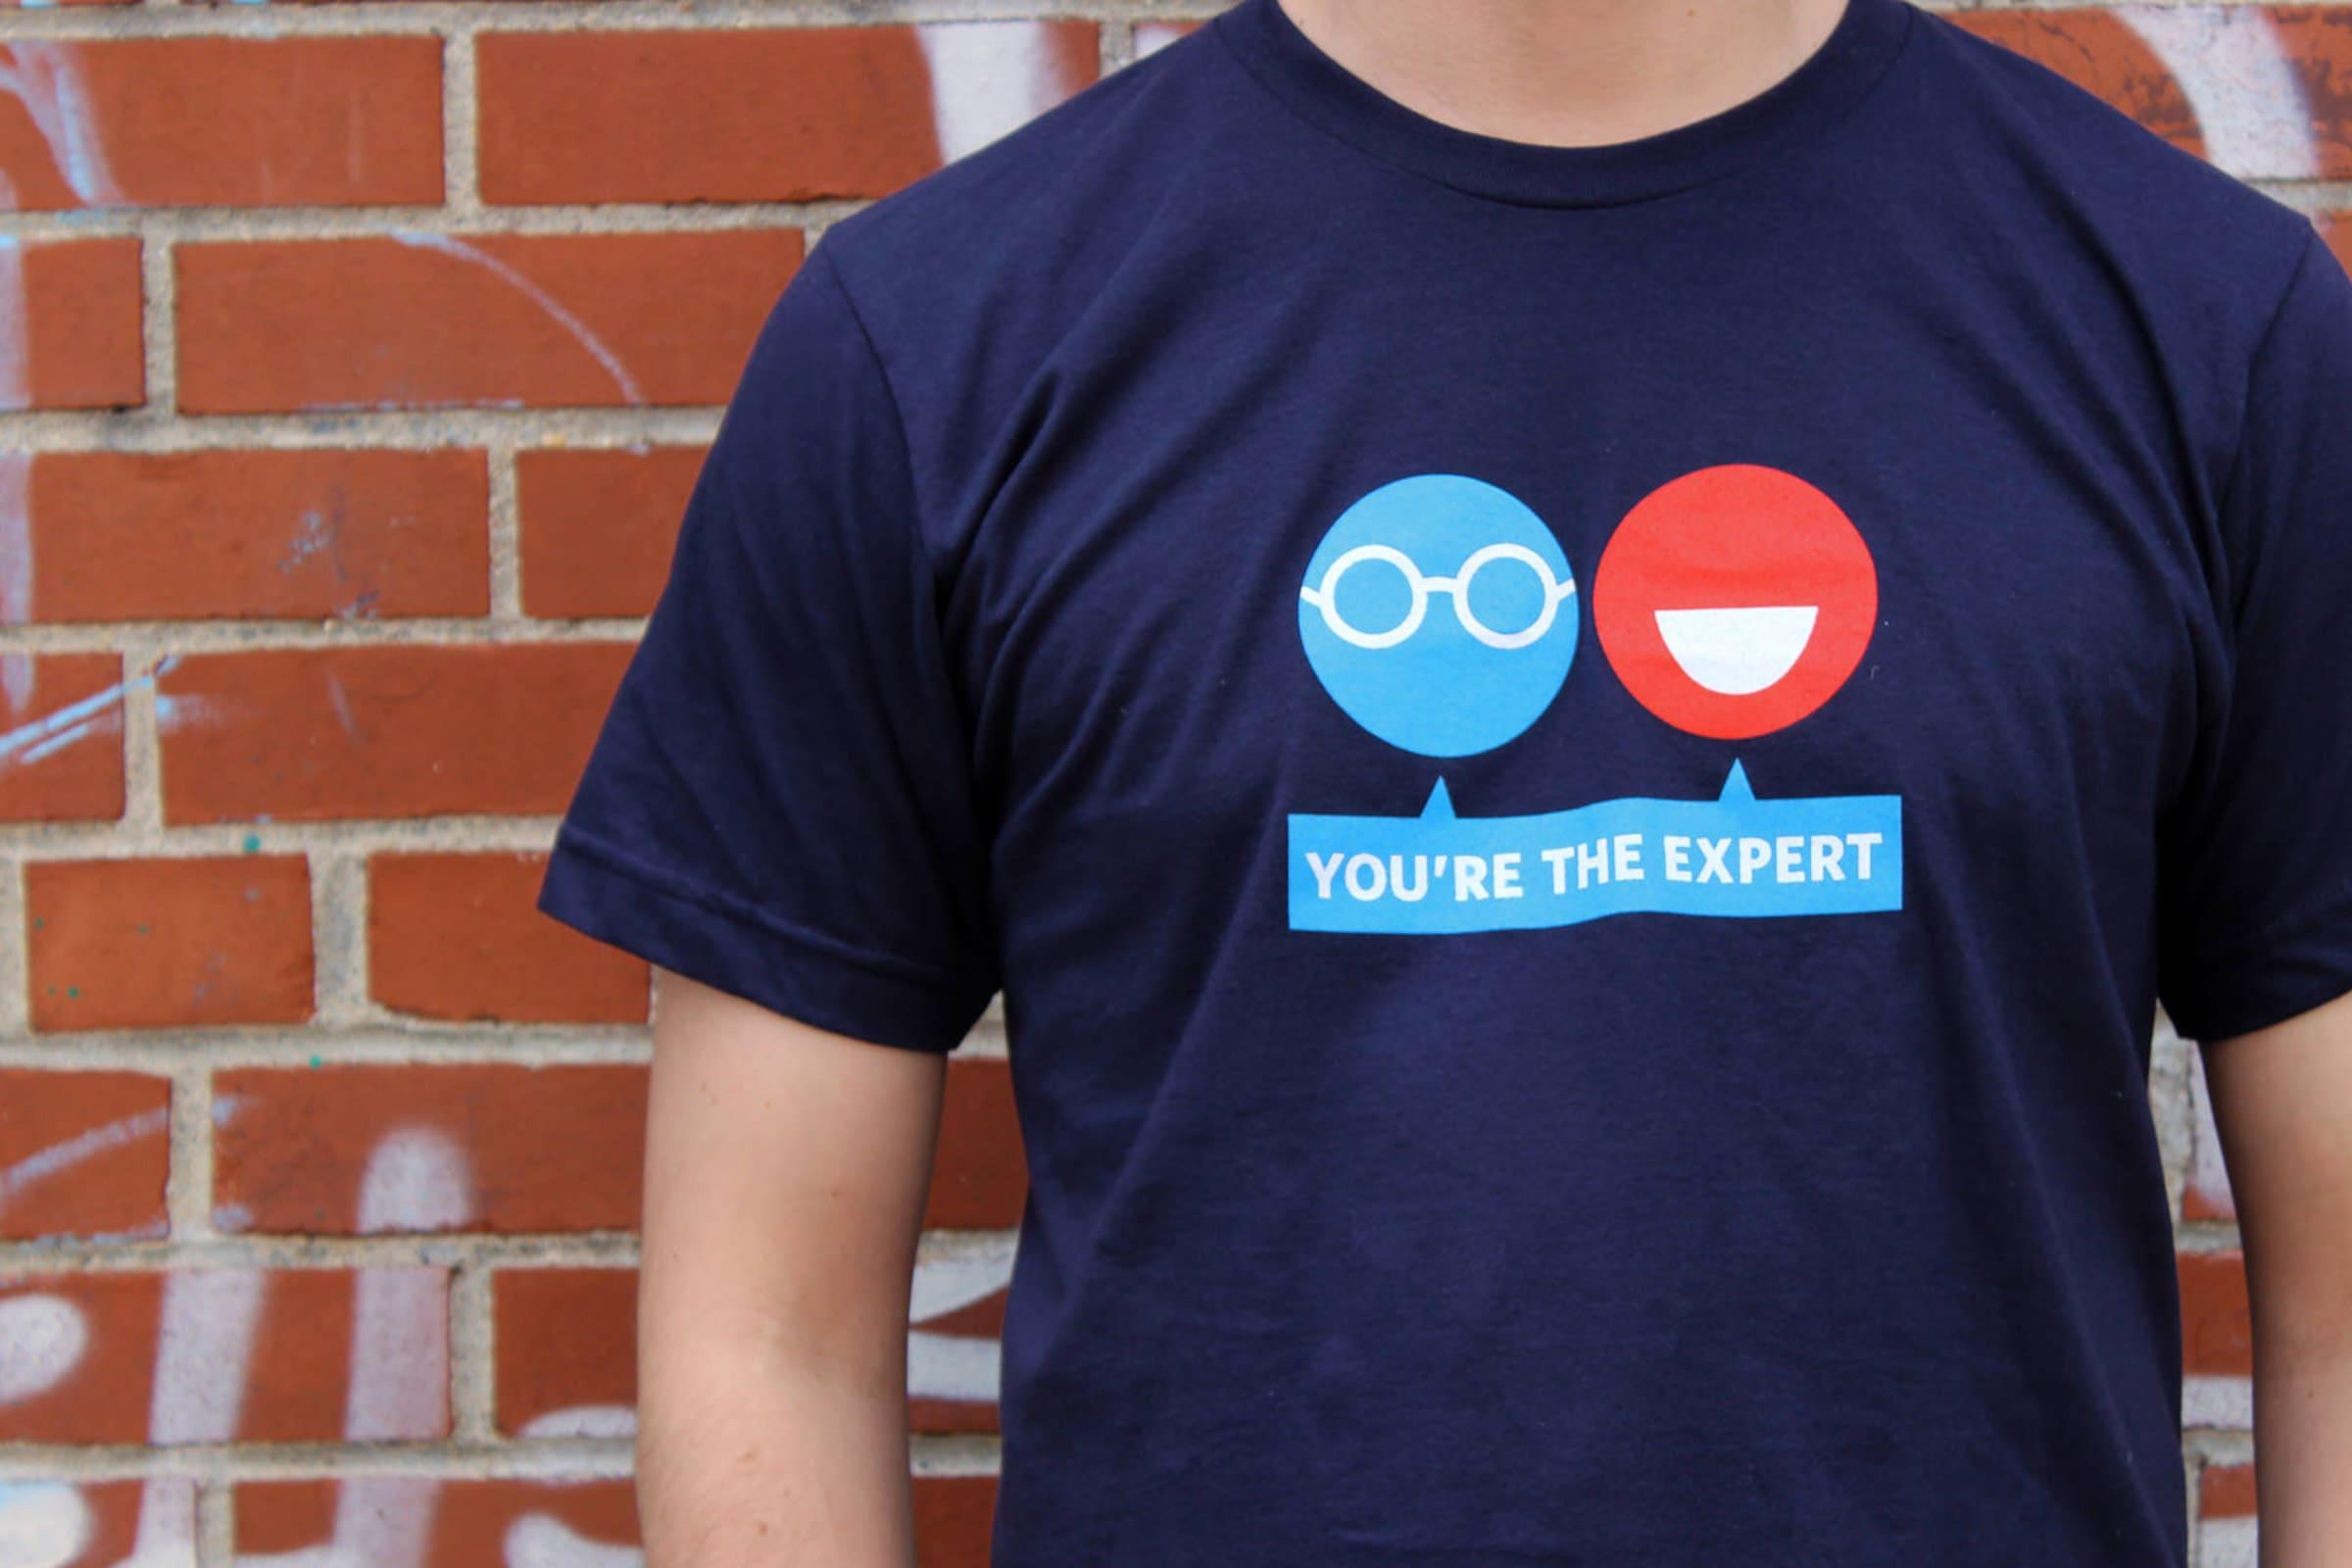 comedy, pattern, t-shirt